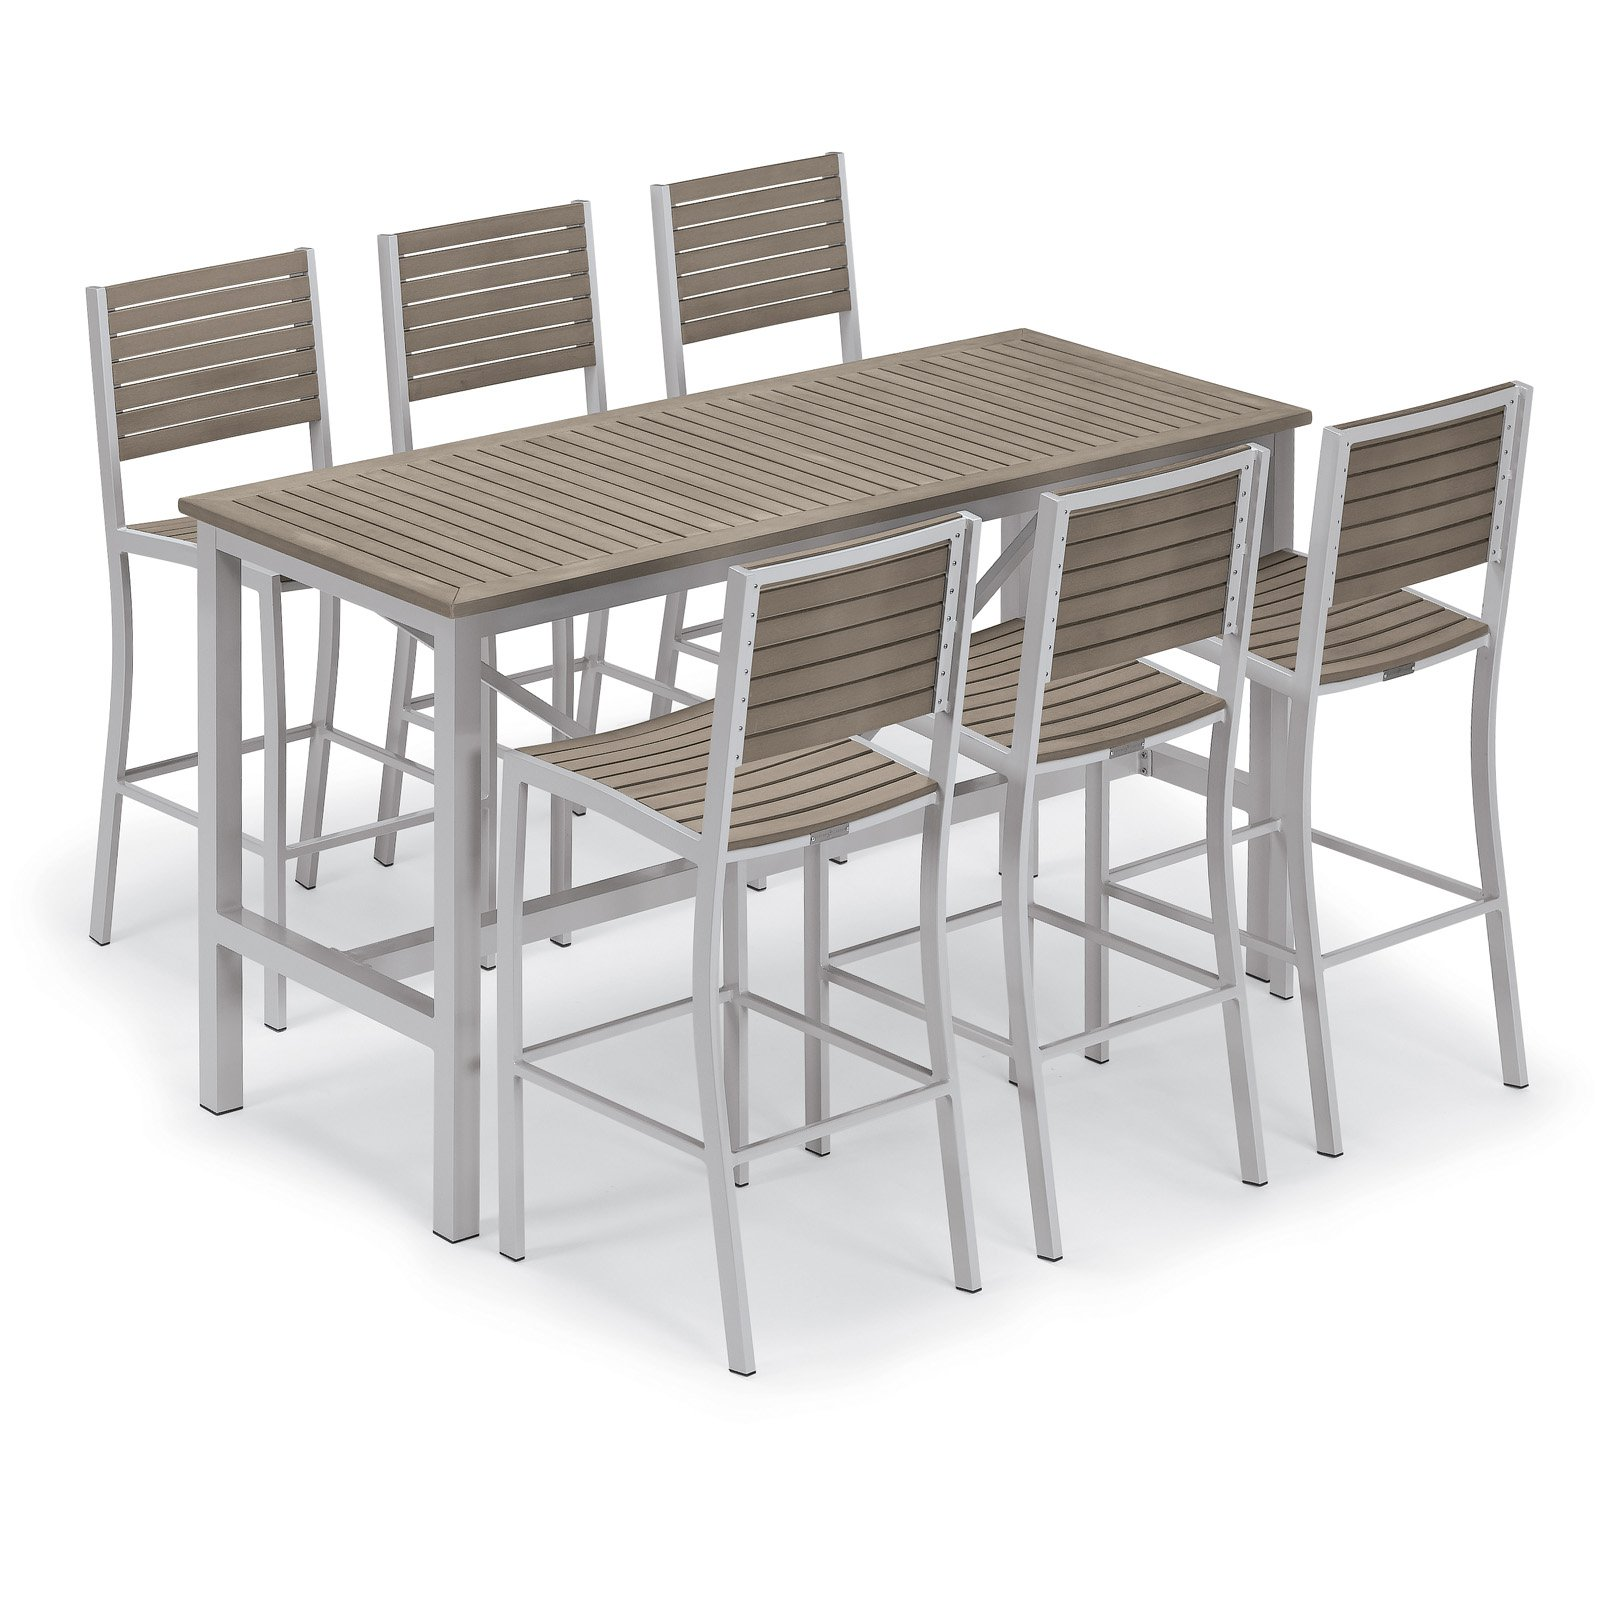 20d5151c640 Outdoor Oxford Garden Travira Tekwood 7 Piece Bar Height Patio Dining Set